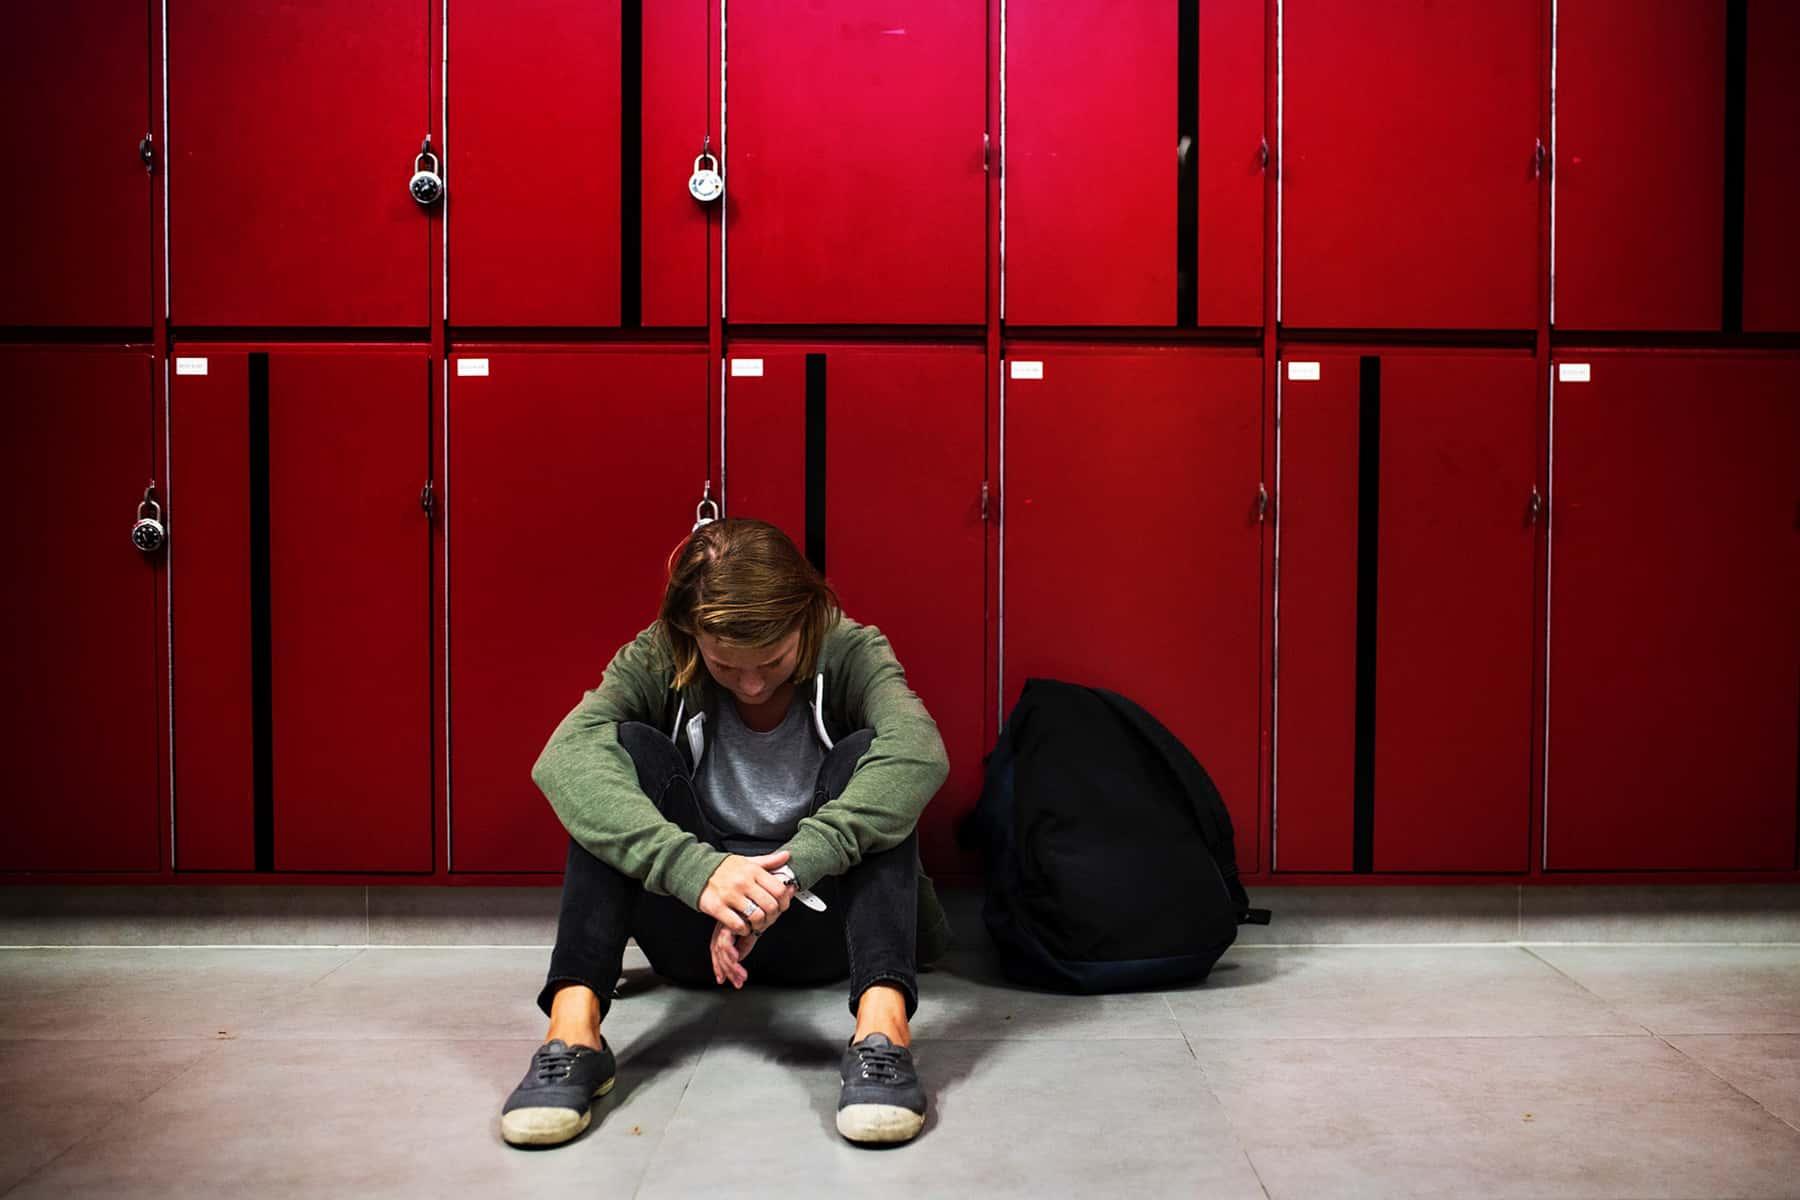 schoolstudentbullyphoto_02